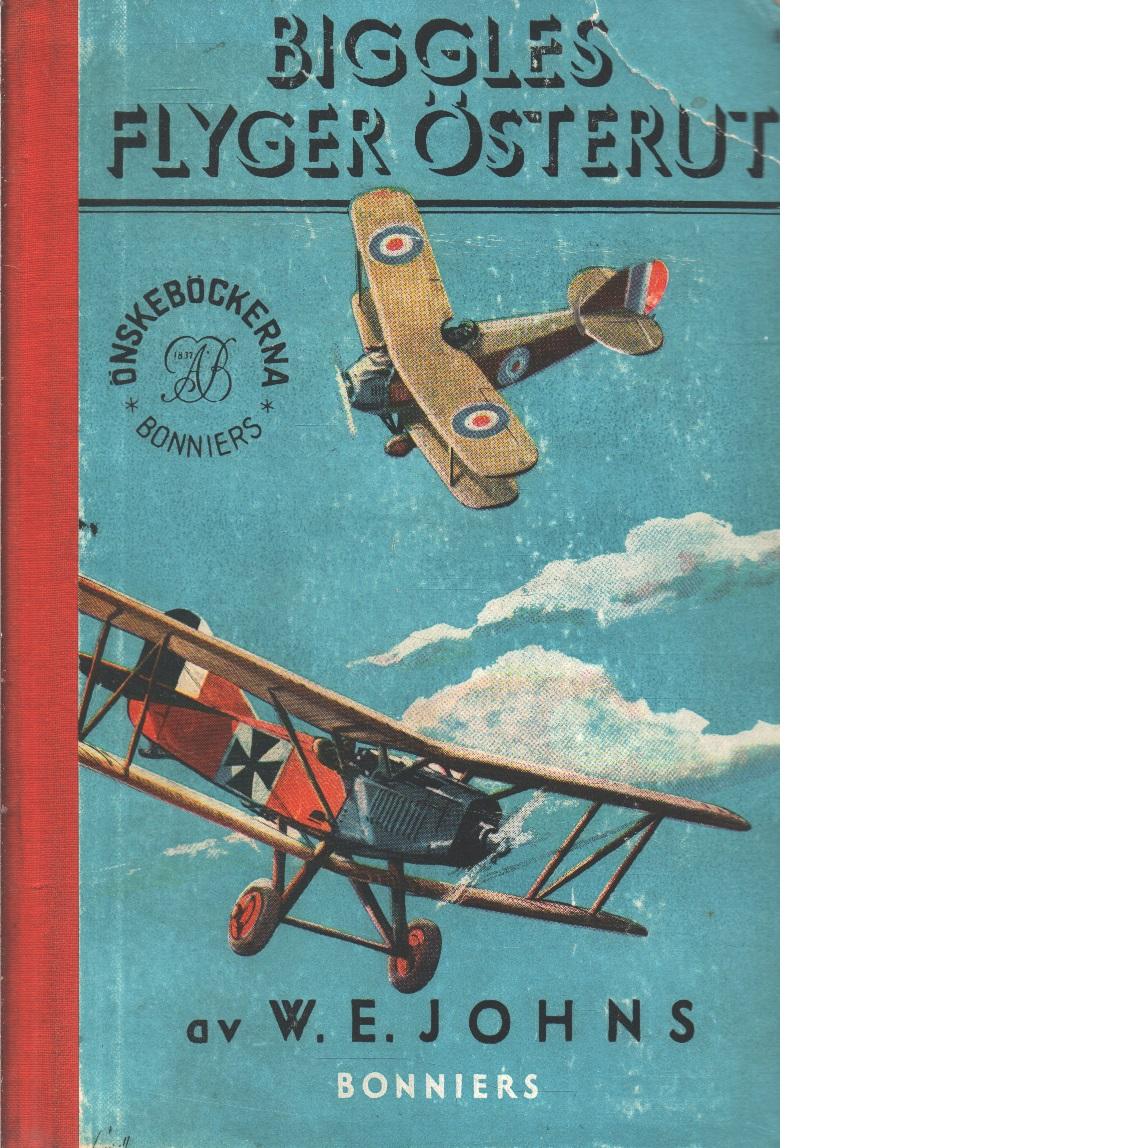 Biggles flyger österut - Johns, William Earl